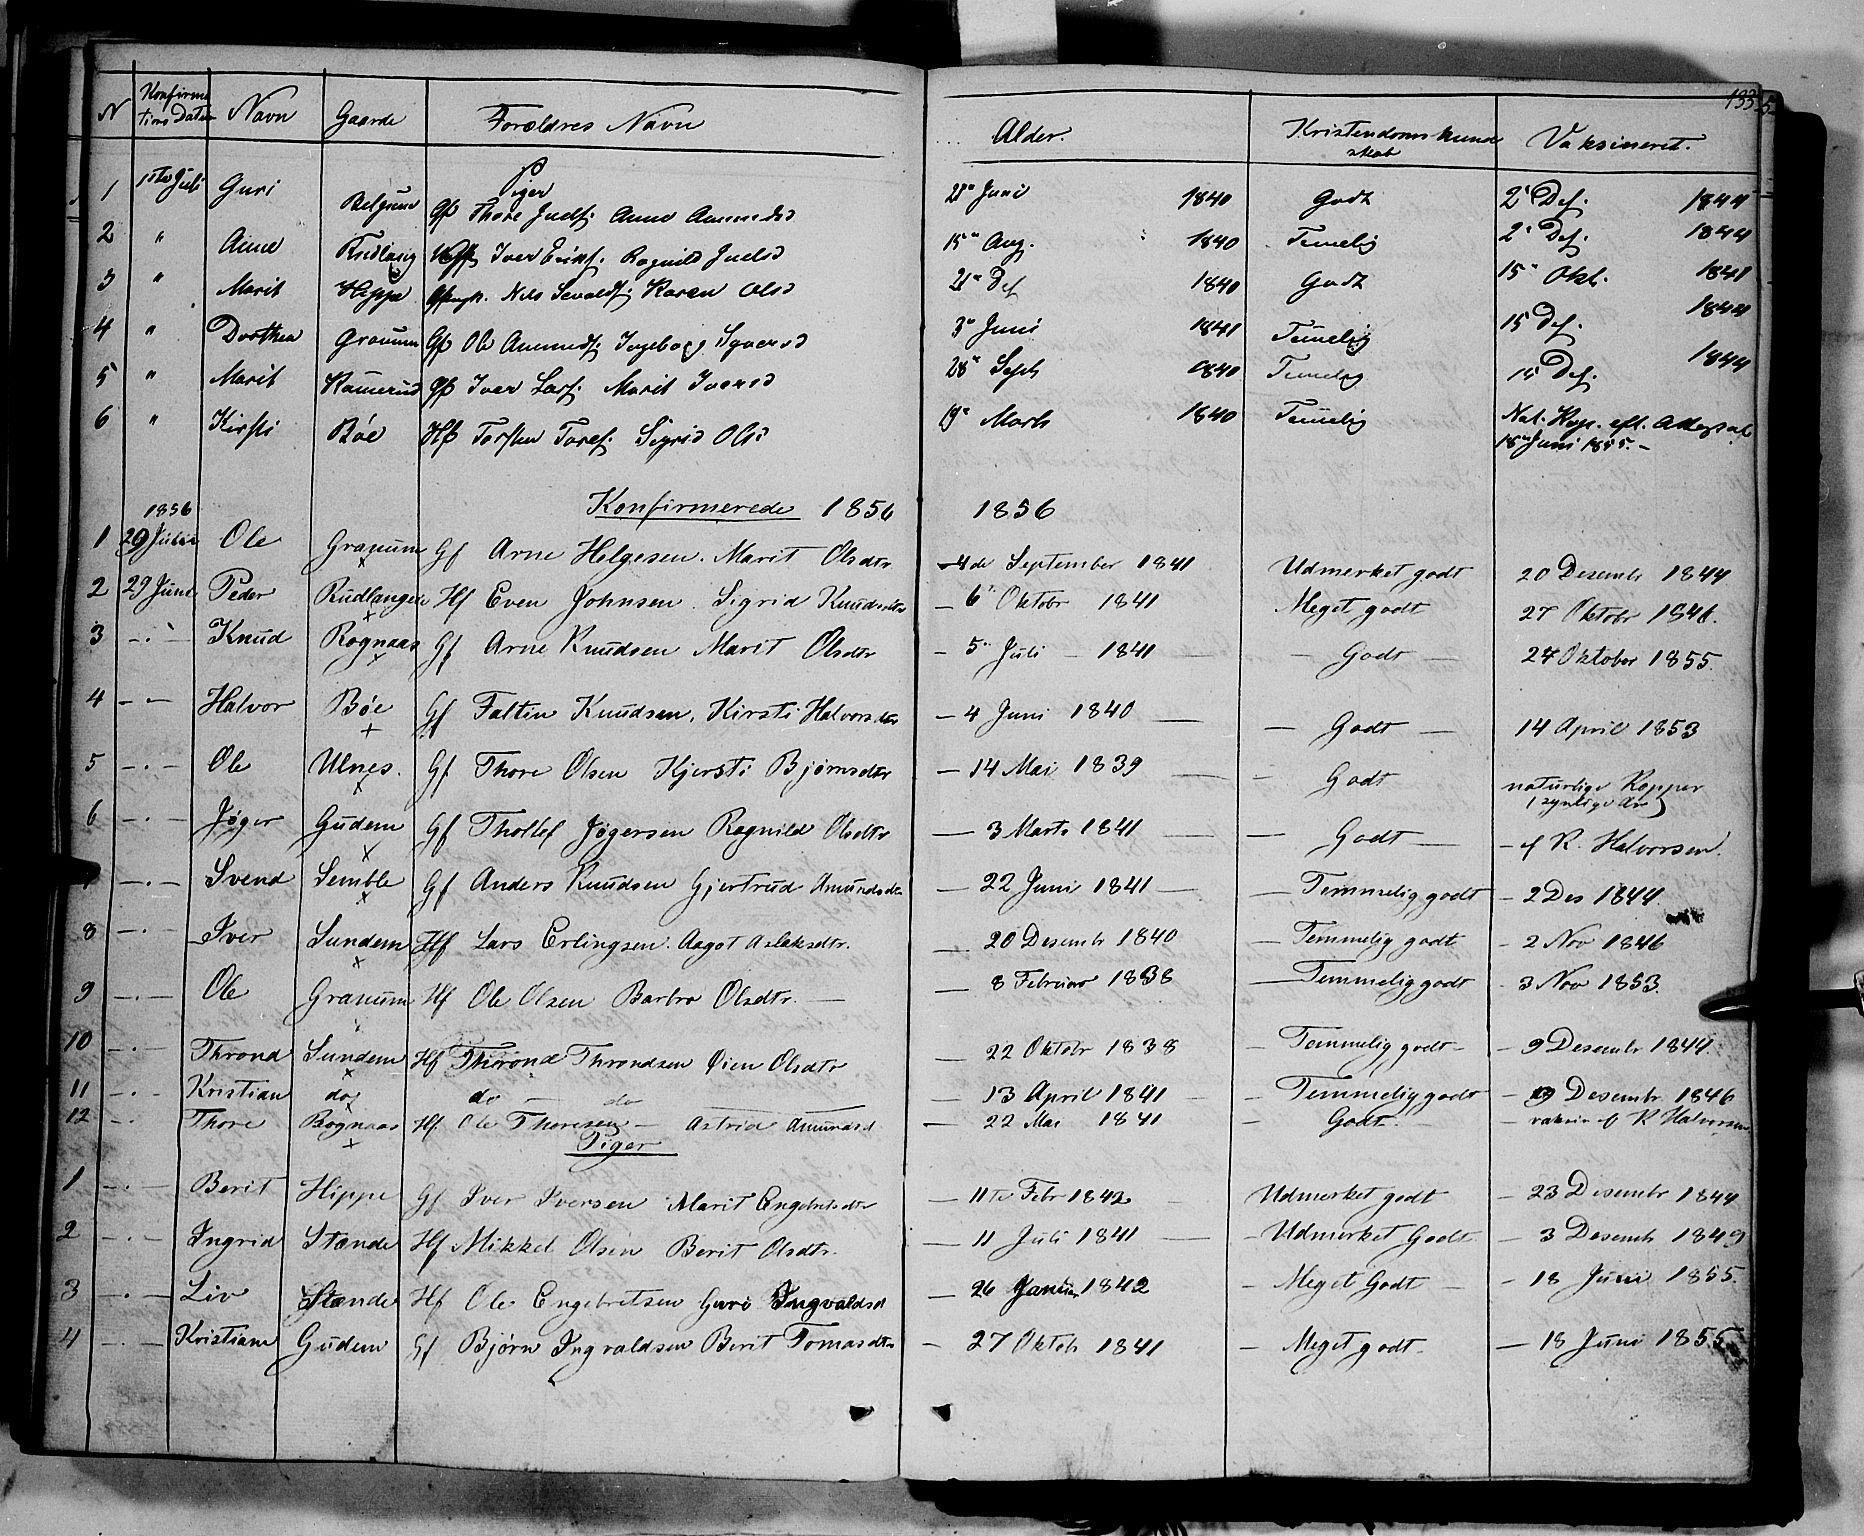 SAH, Nord-Aurdal prestekontor, Ministerialbok nr. 6, 1842-1863, s. 133